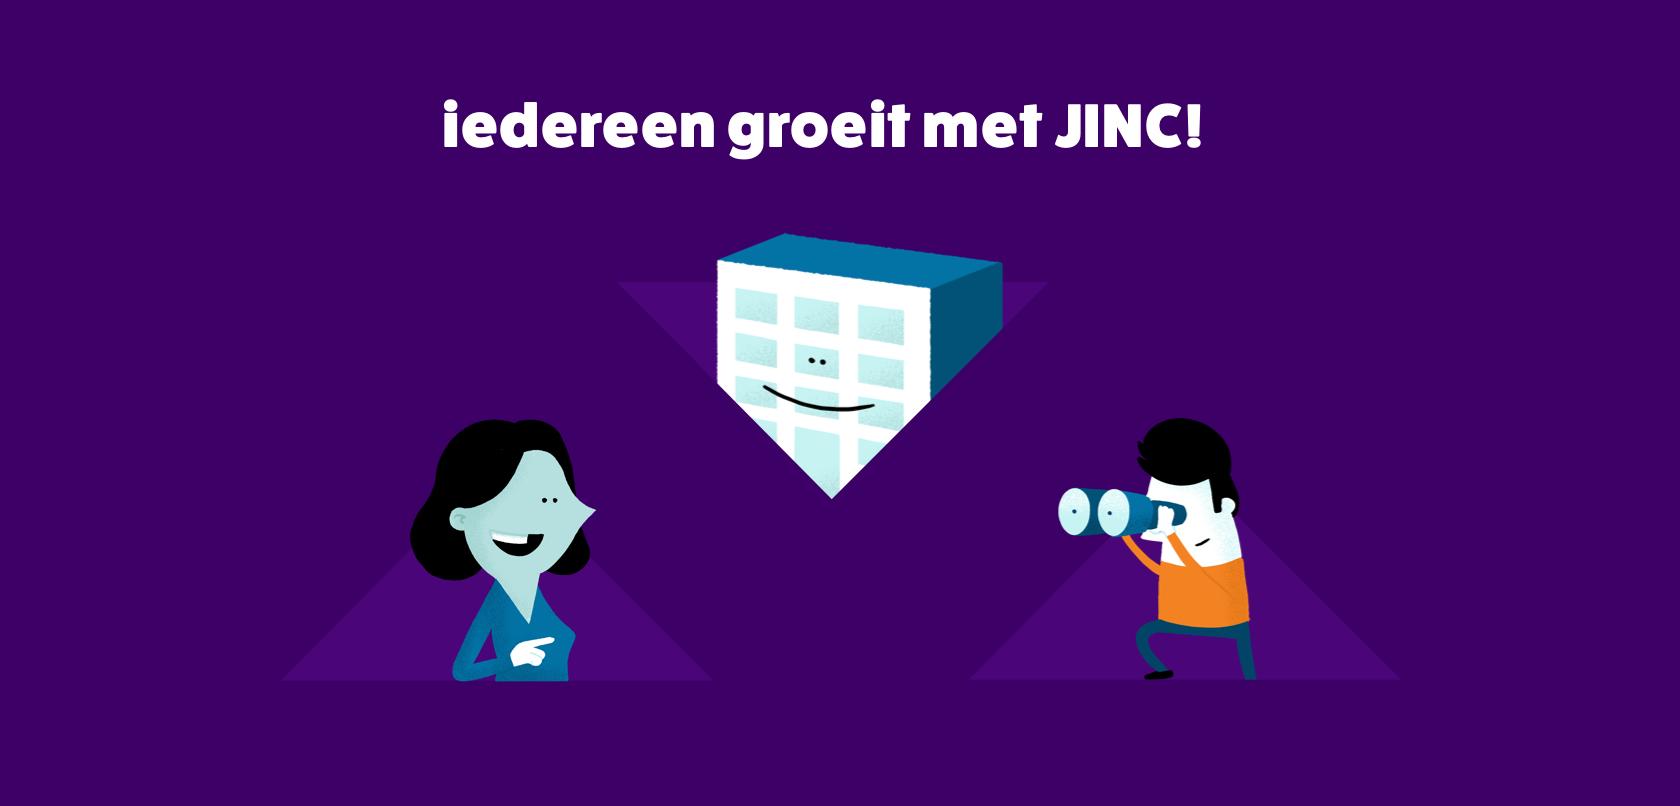 jinc-macbook-1680-